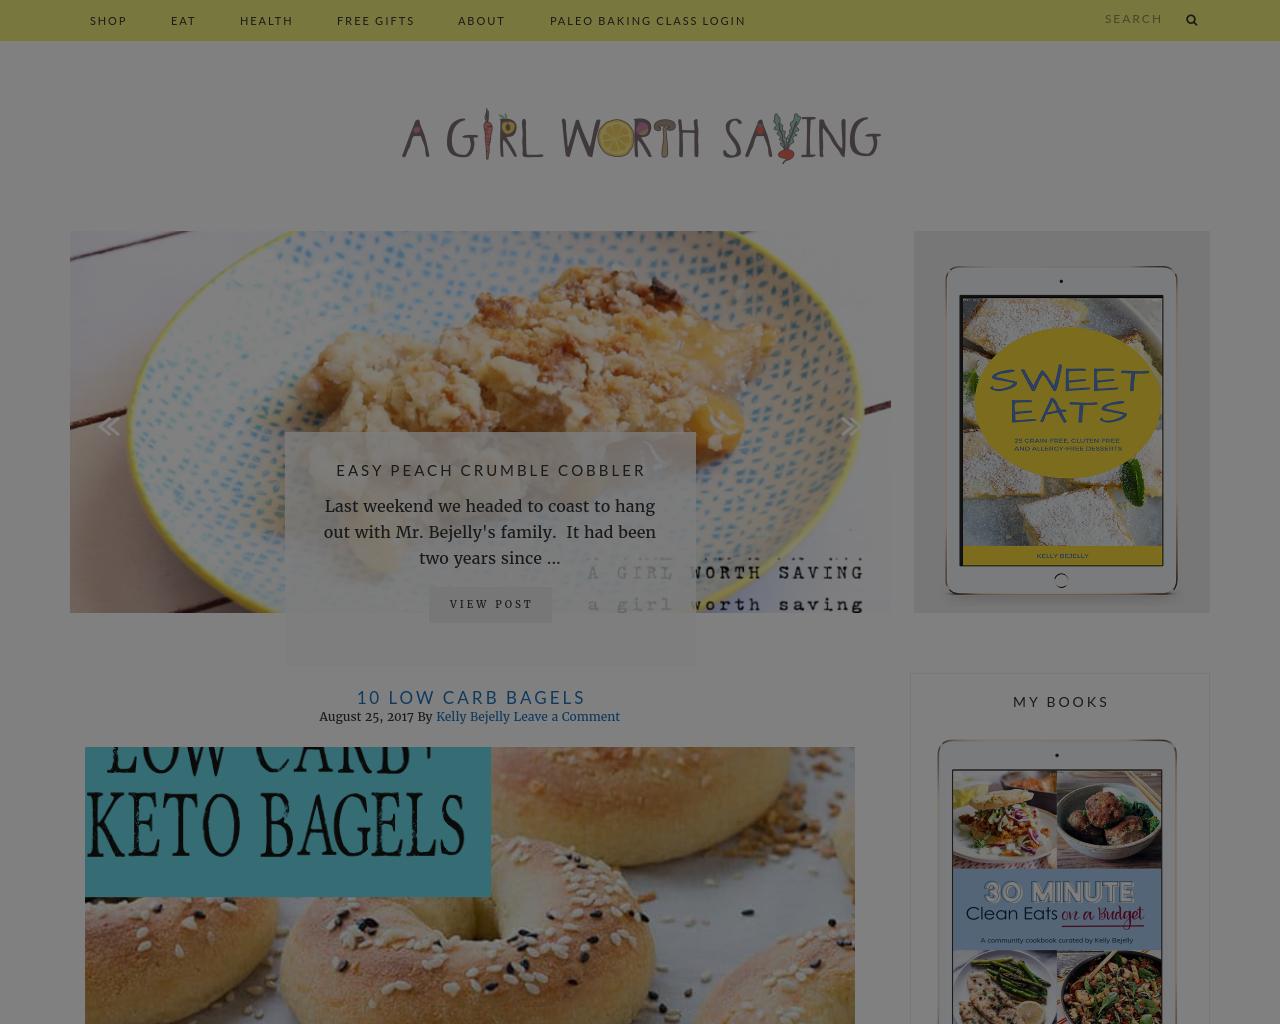 A-Girl-Worth-Saving-Advertising-Reviews-Pricing